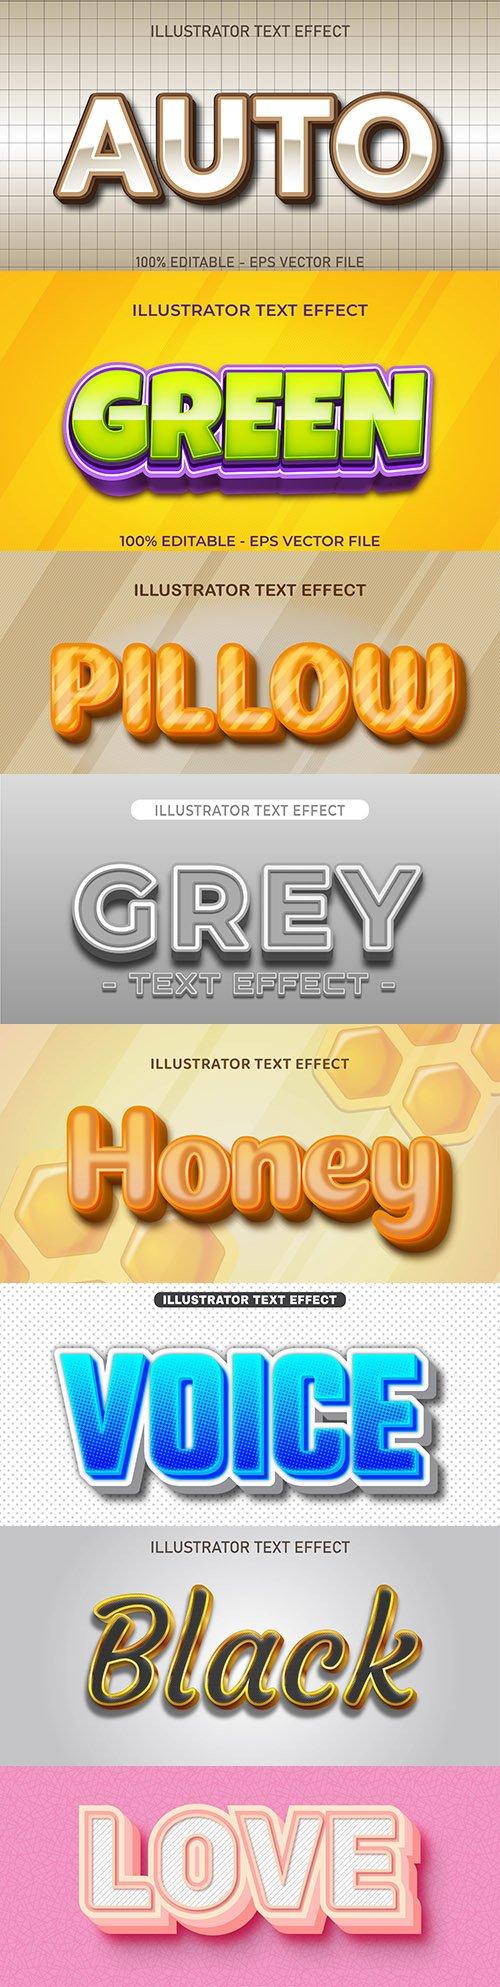 Editable font effect text collection illustration design 195